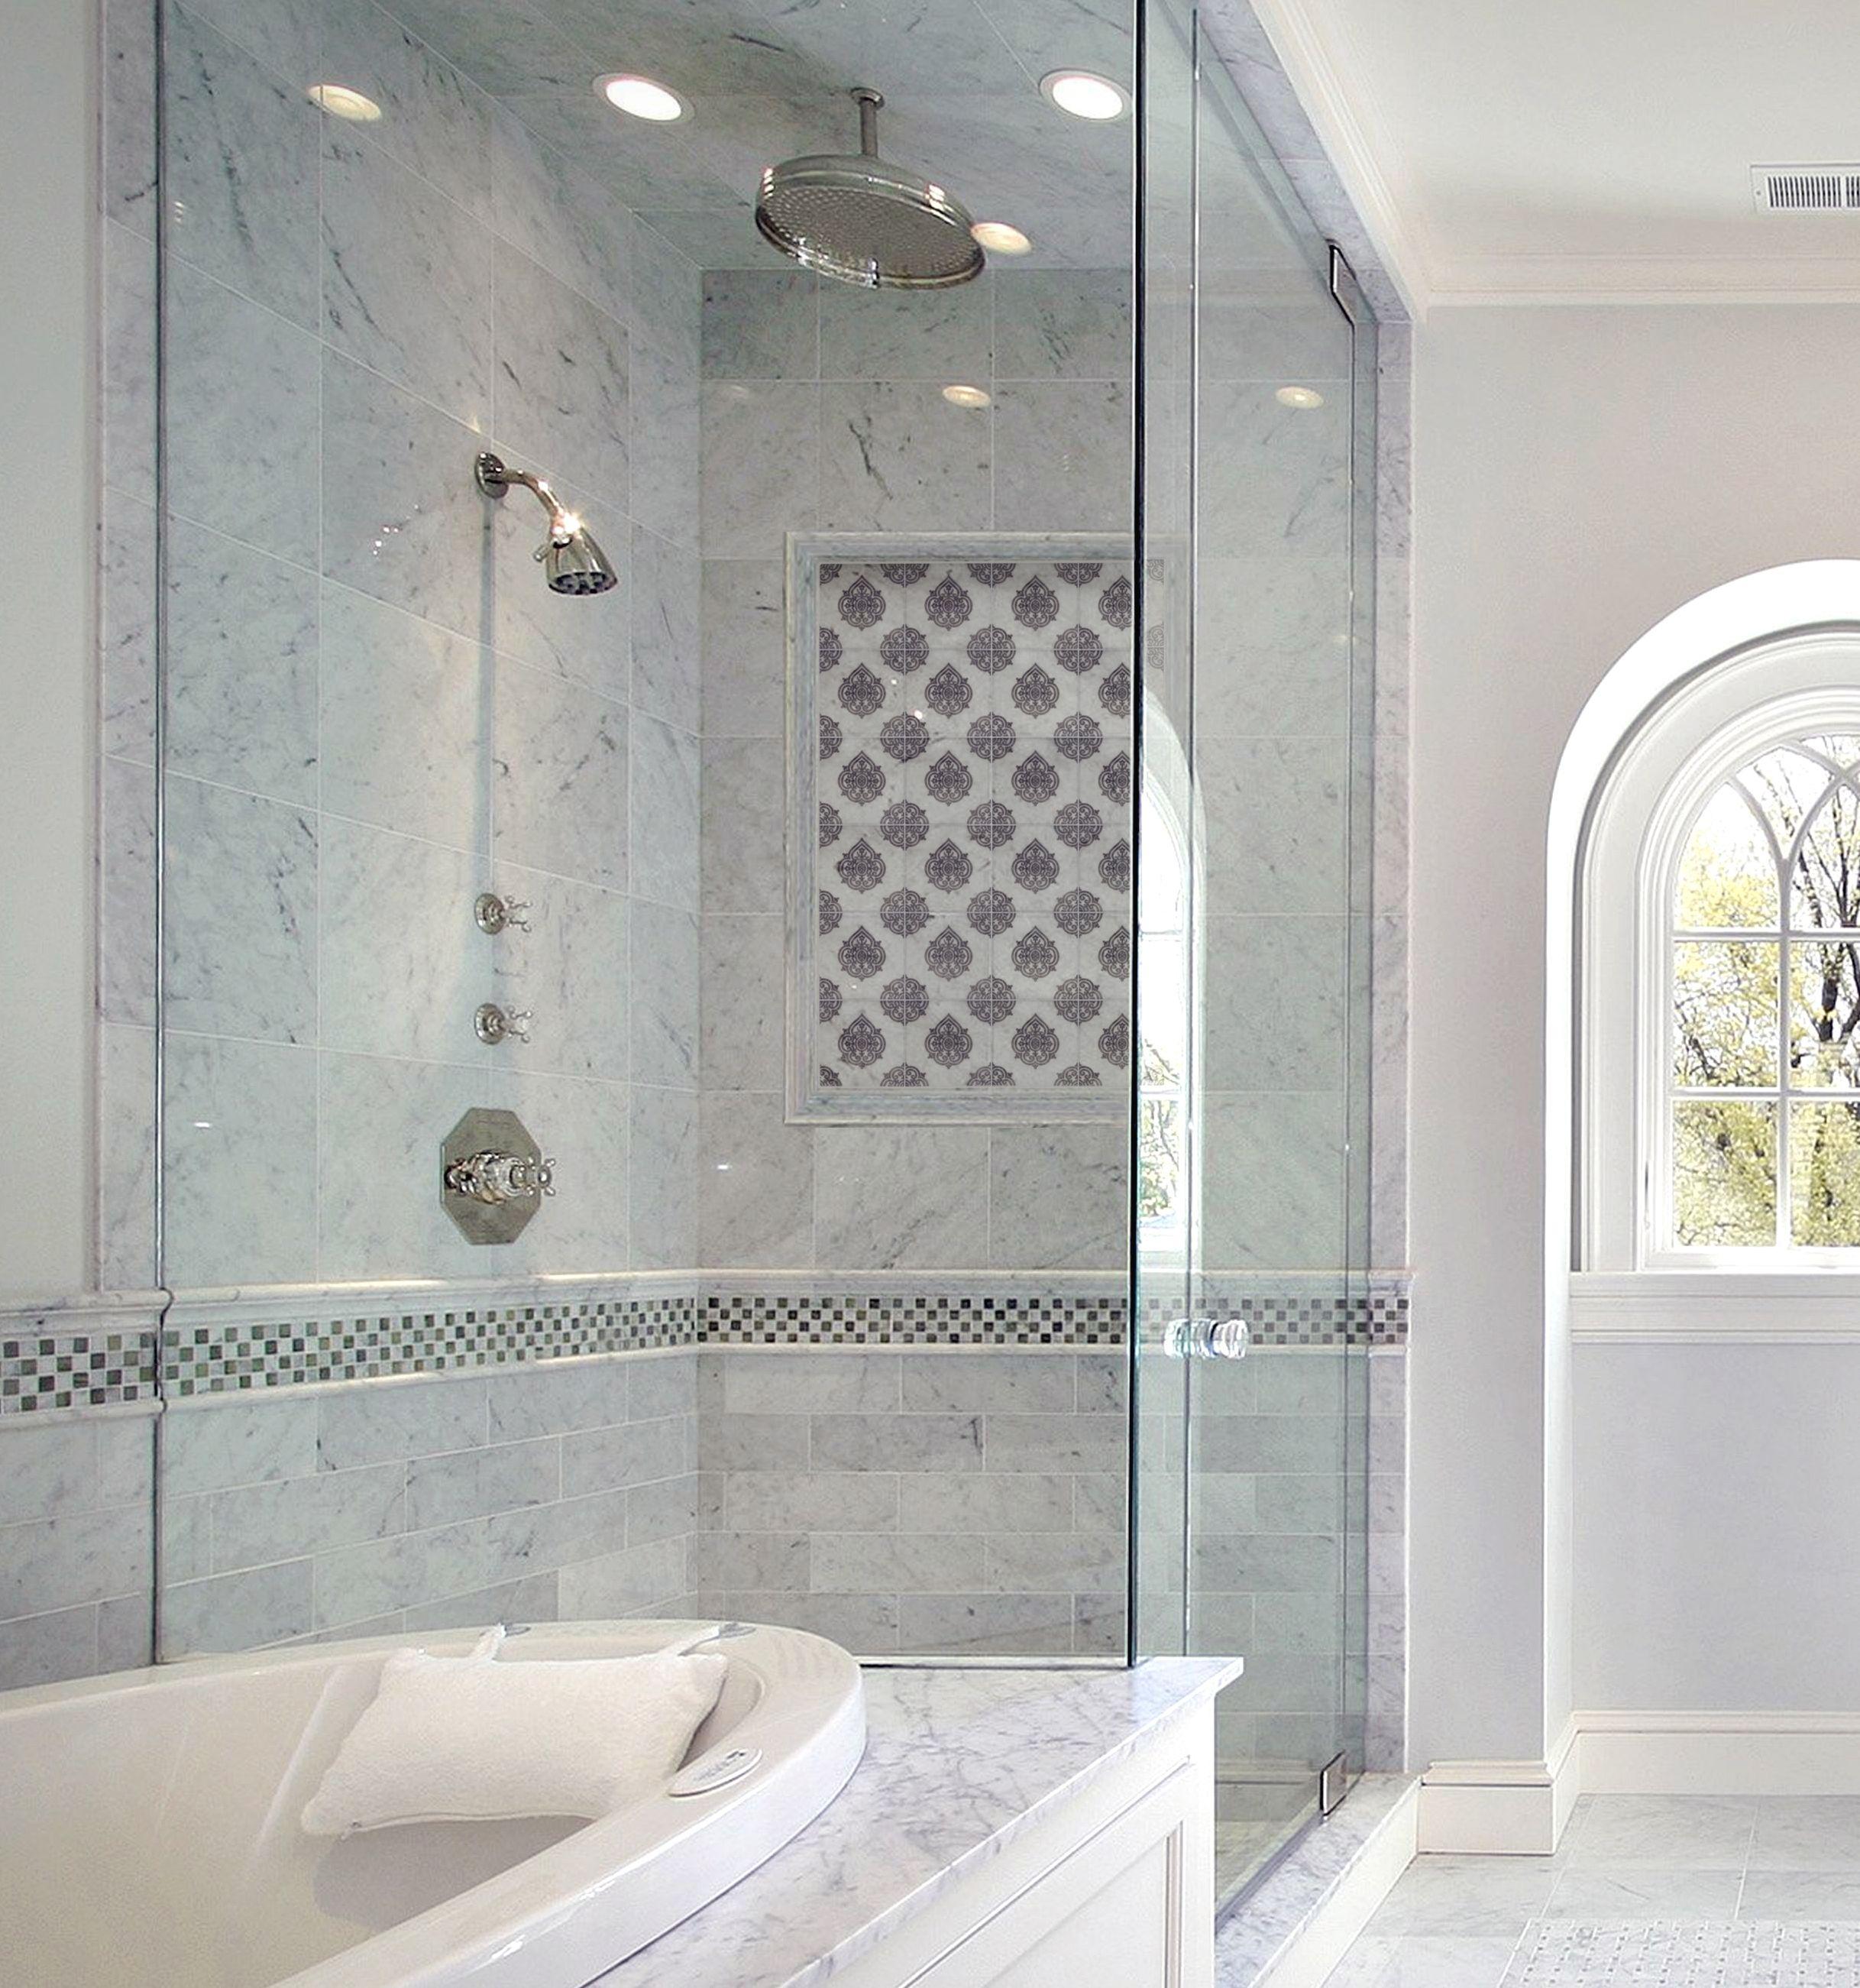 Caprice Collection Bath Tile Bath Tiles Bathroom